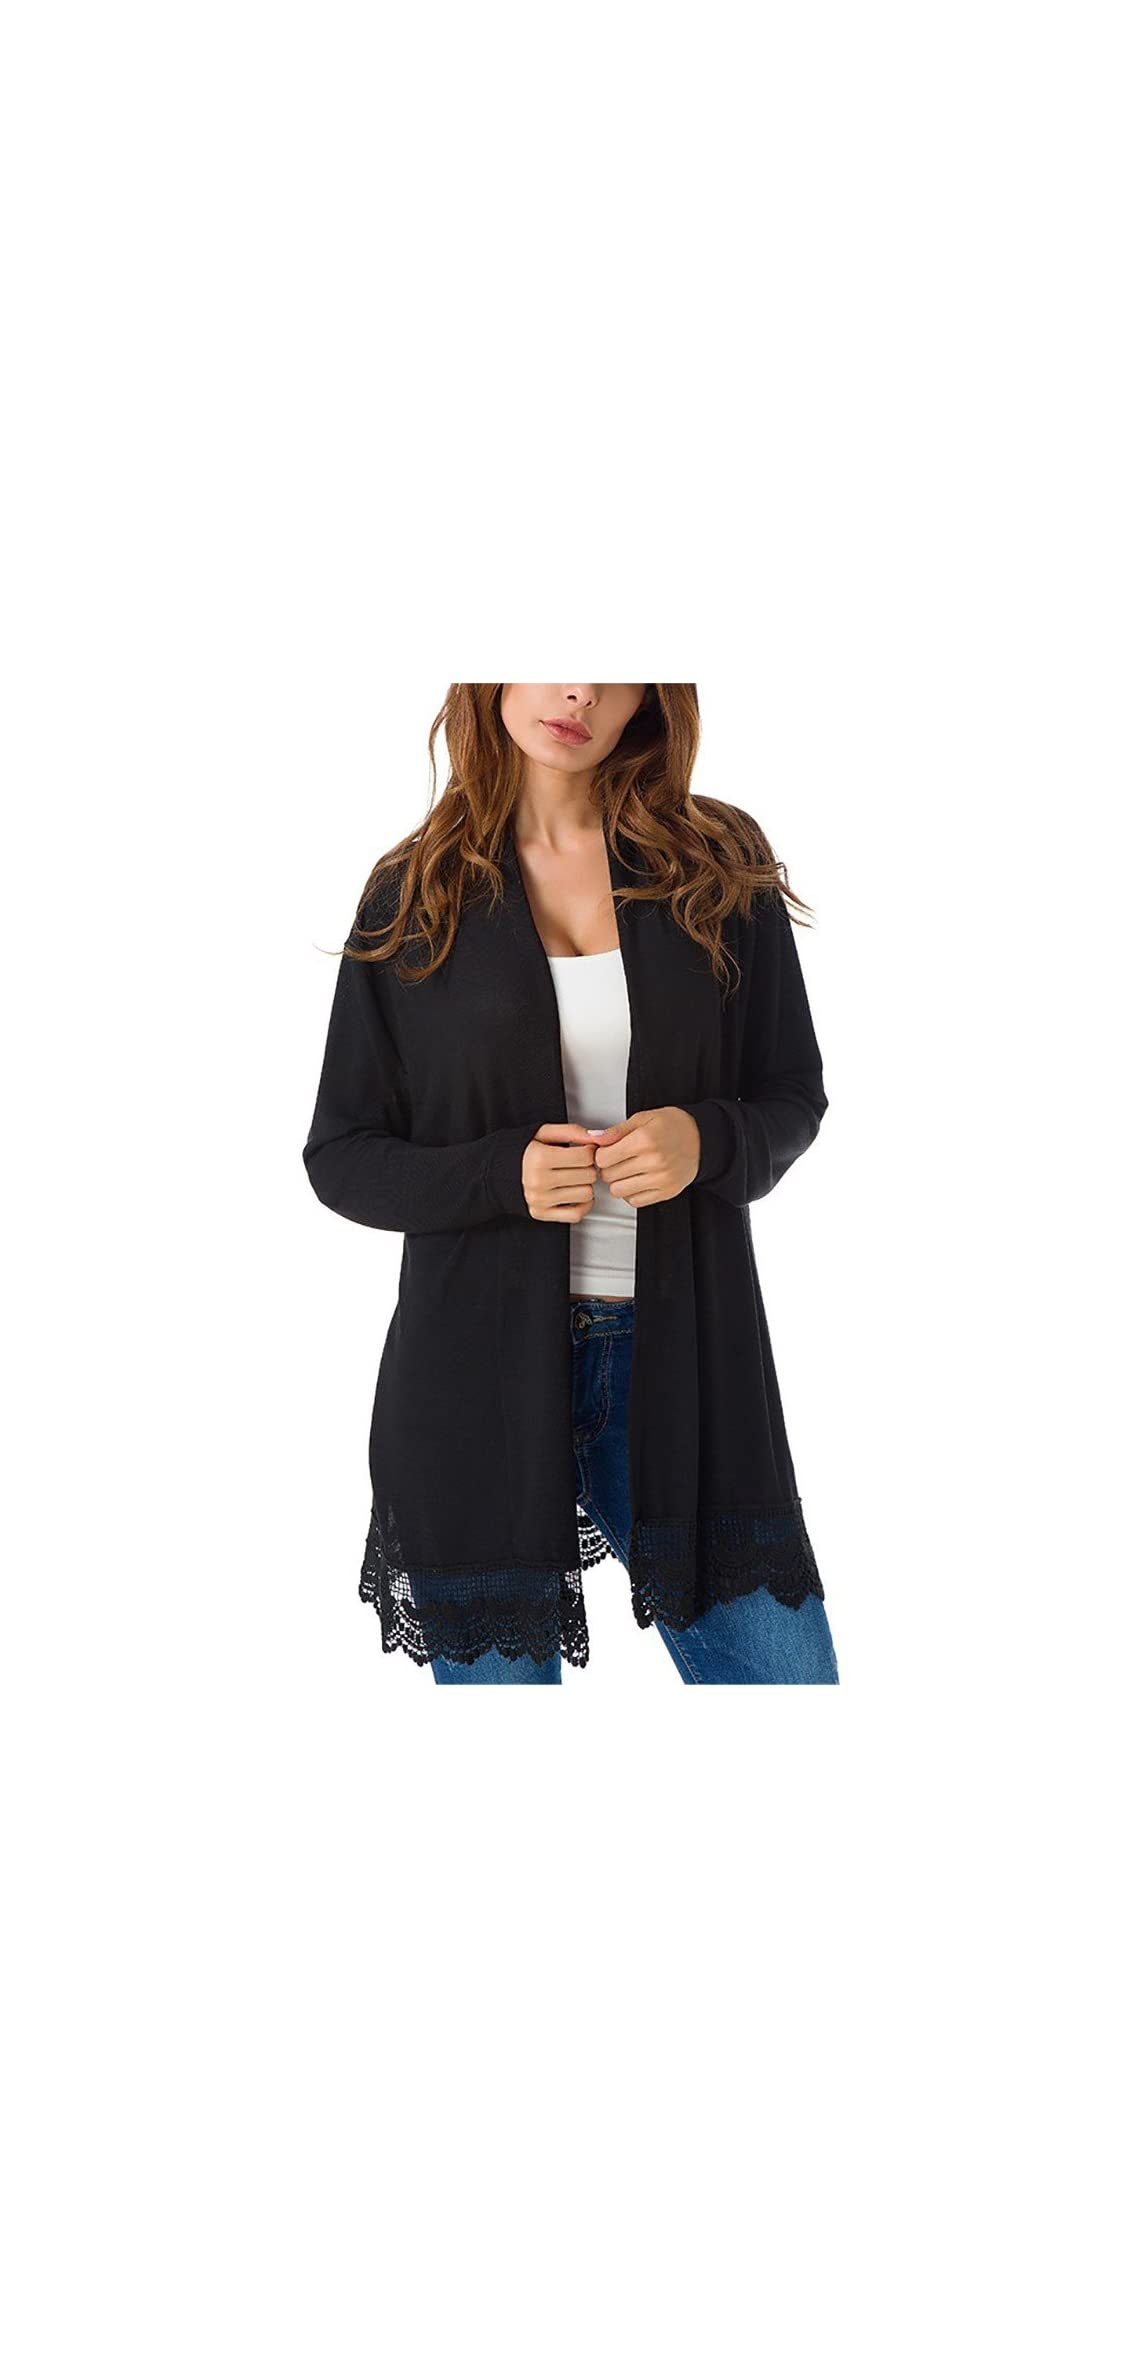 Women's Elegant Black Lacy Splicing Sweater Cardigan Long